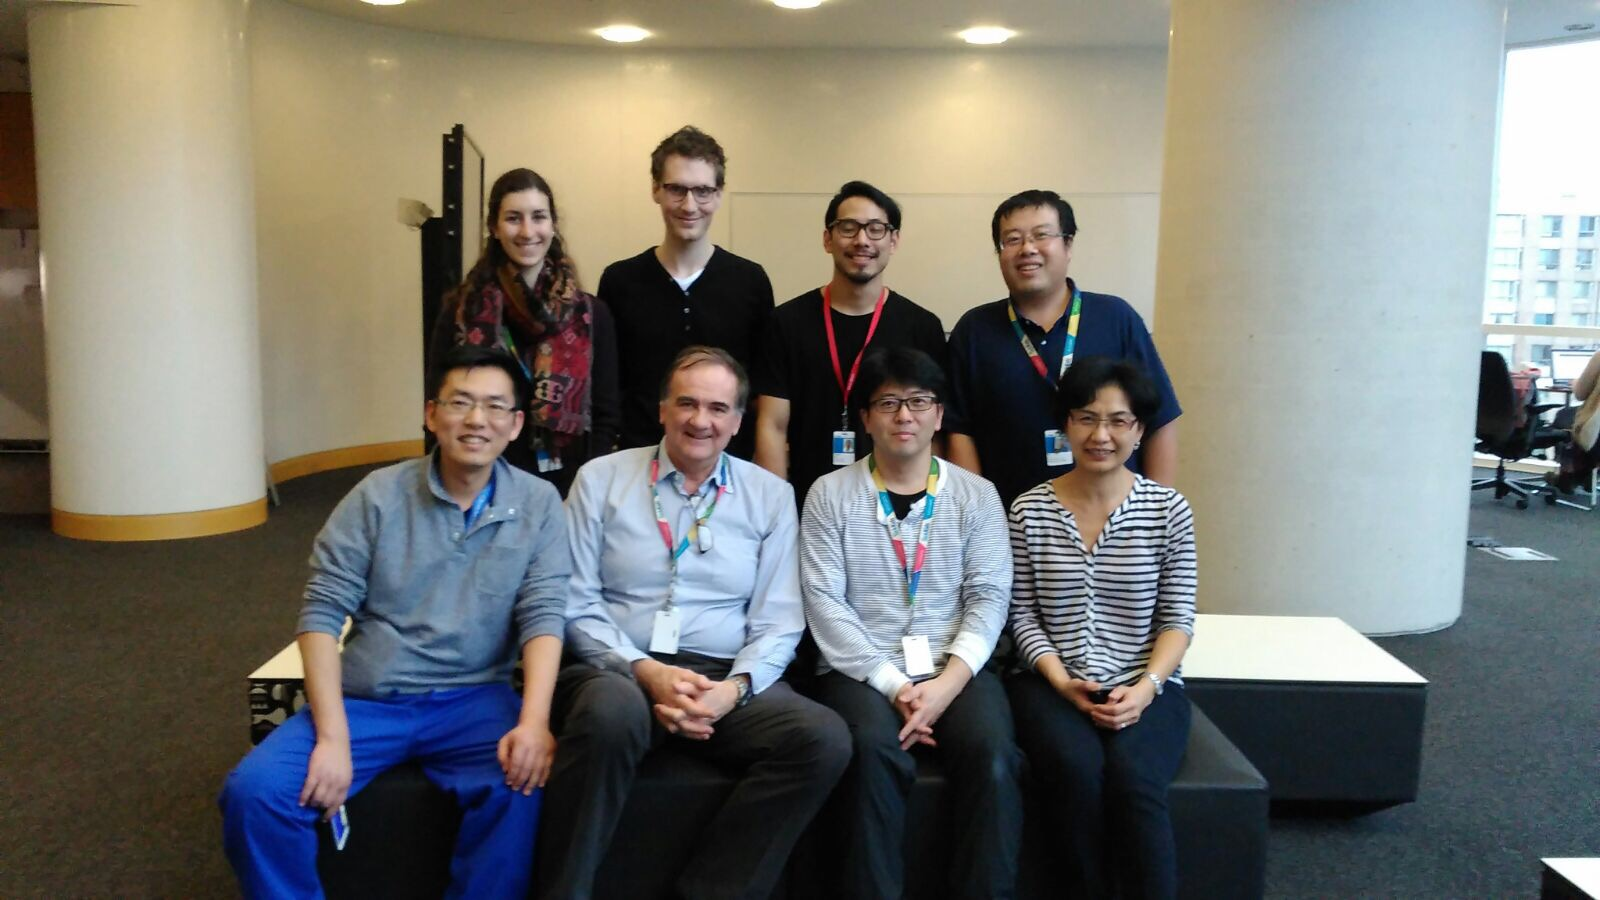 Photo of lab members (Alison Hock, Maarten Janssen Lok, Shogo Seo, Bo Li, Yong Chen, Agostino Pierro, Yuhki Koike, Carol Lee)